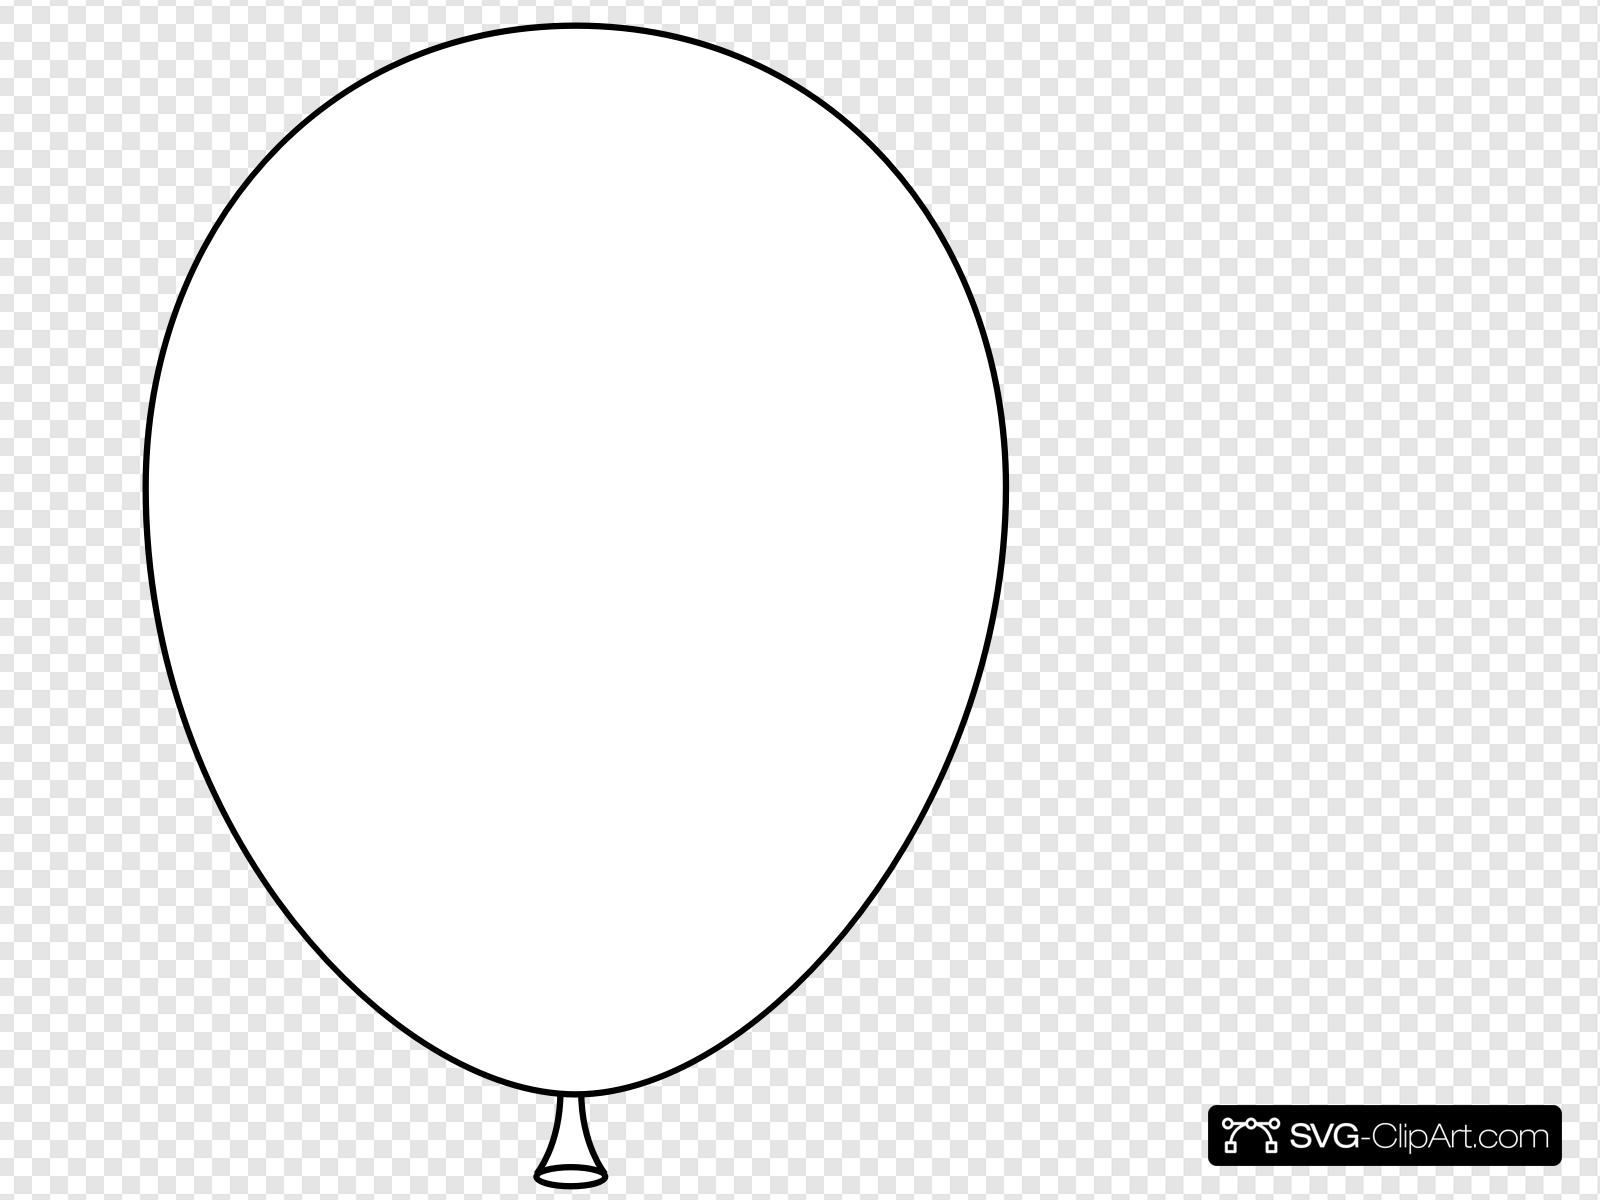 White Balloon Clip art, Icon and SVG.